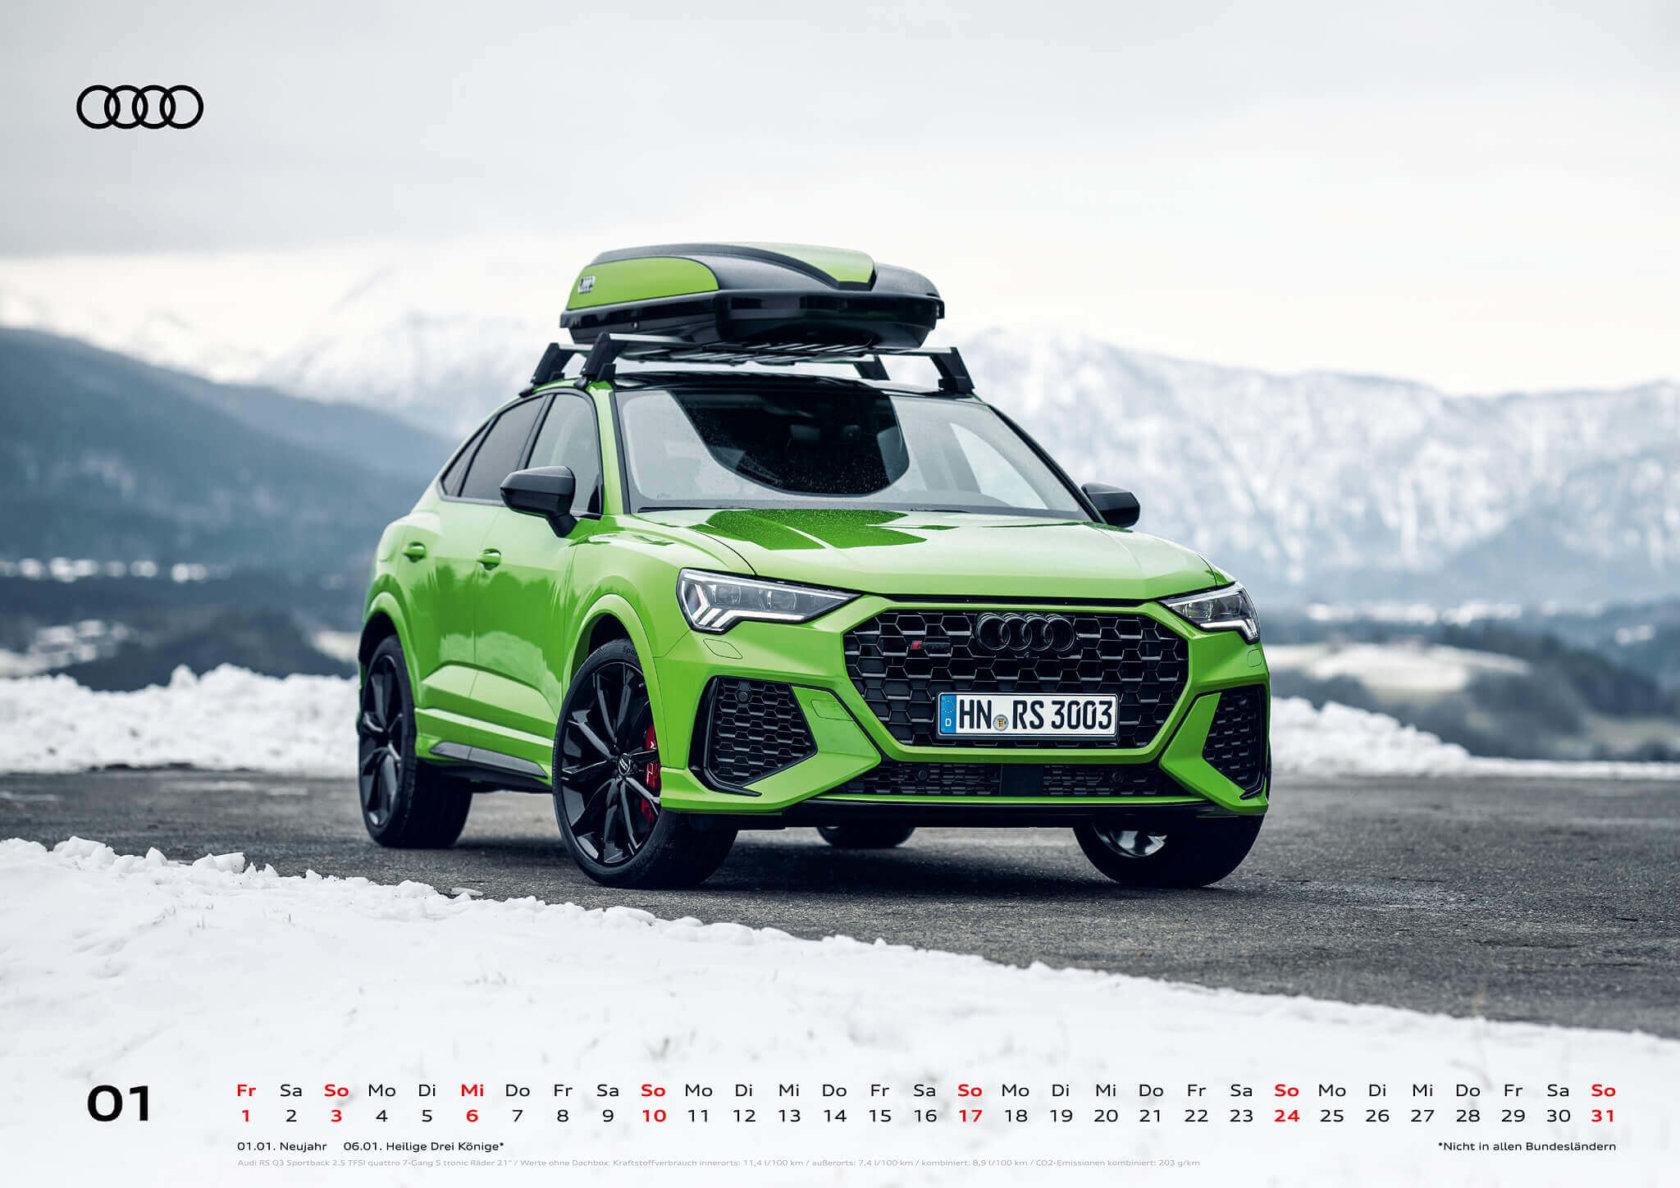 Audi Kalender 2021 - DIN A2 / Audi RSQ3 Sportback